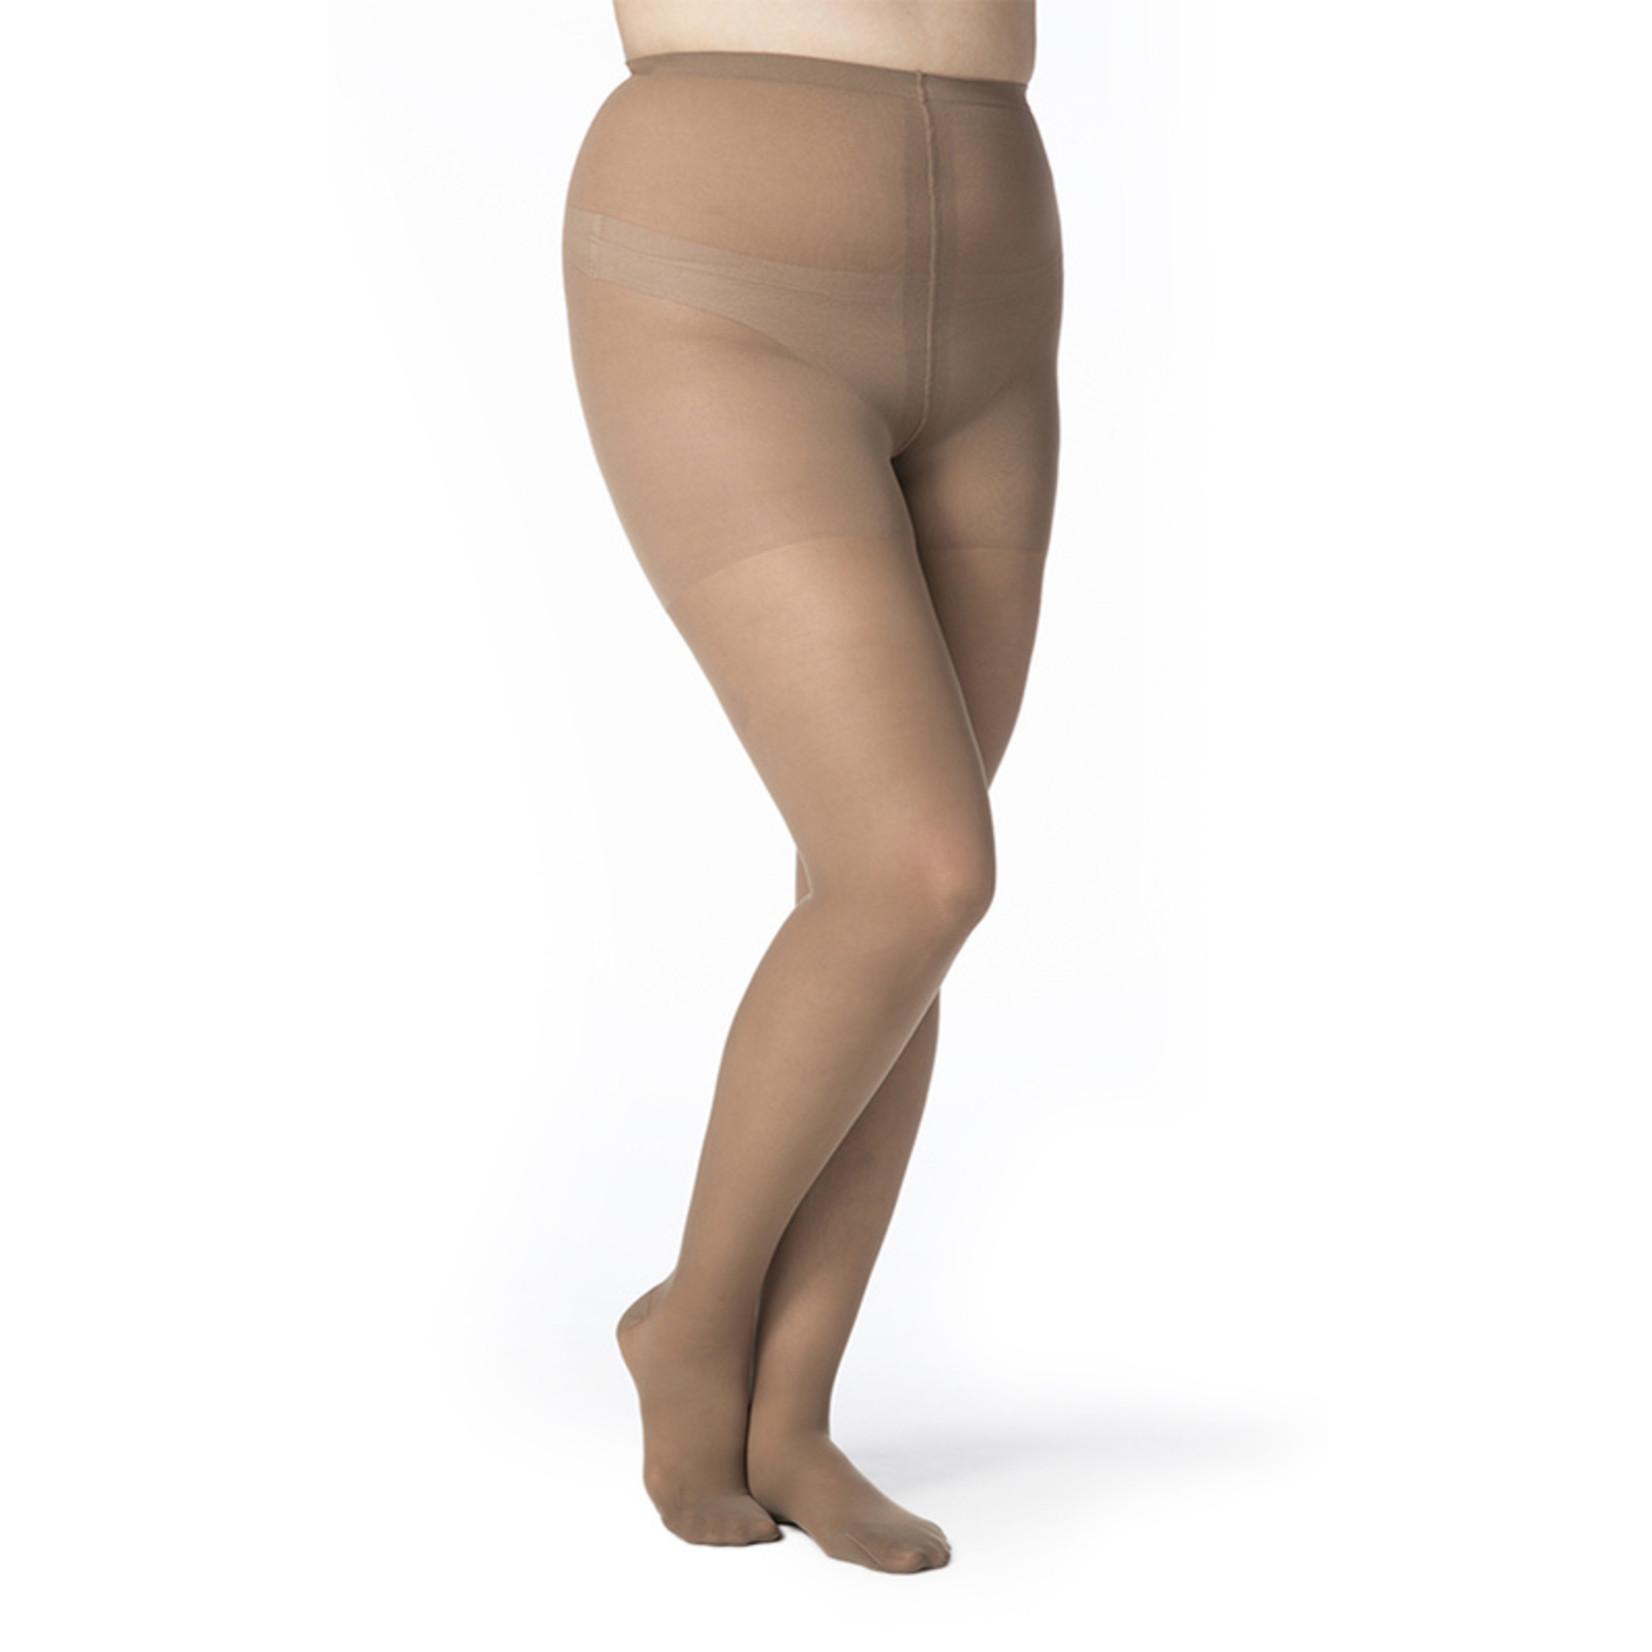 SIGVARIS Women's Style Sheer Pantyhose 20-30mmHg